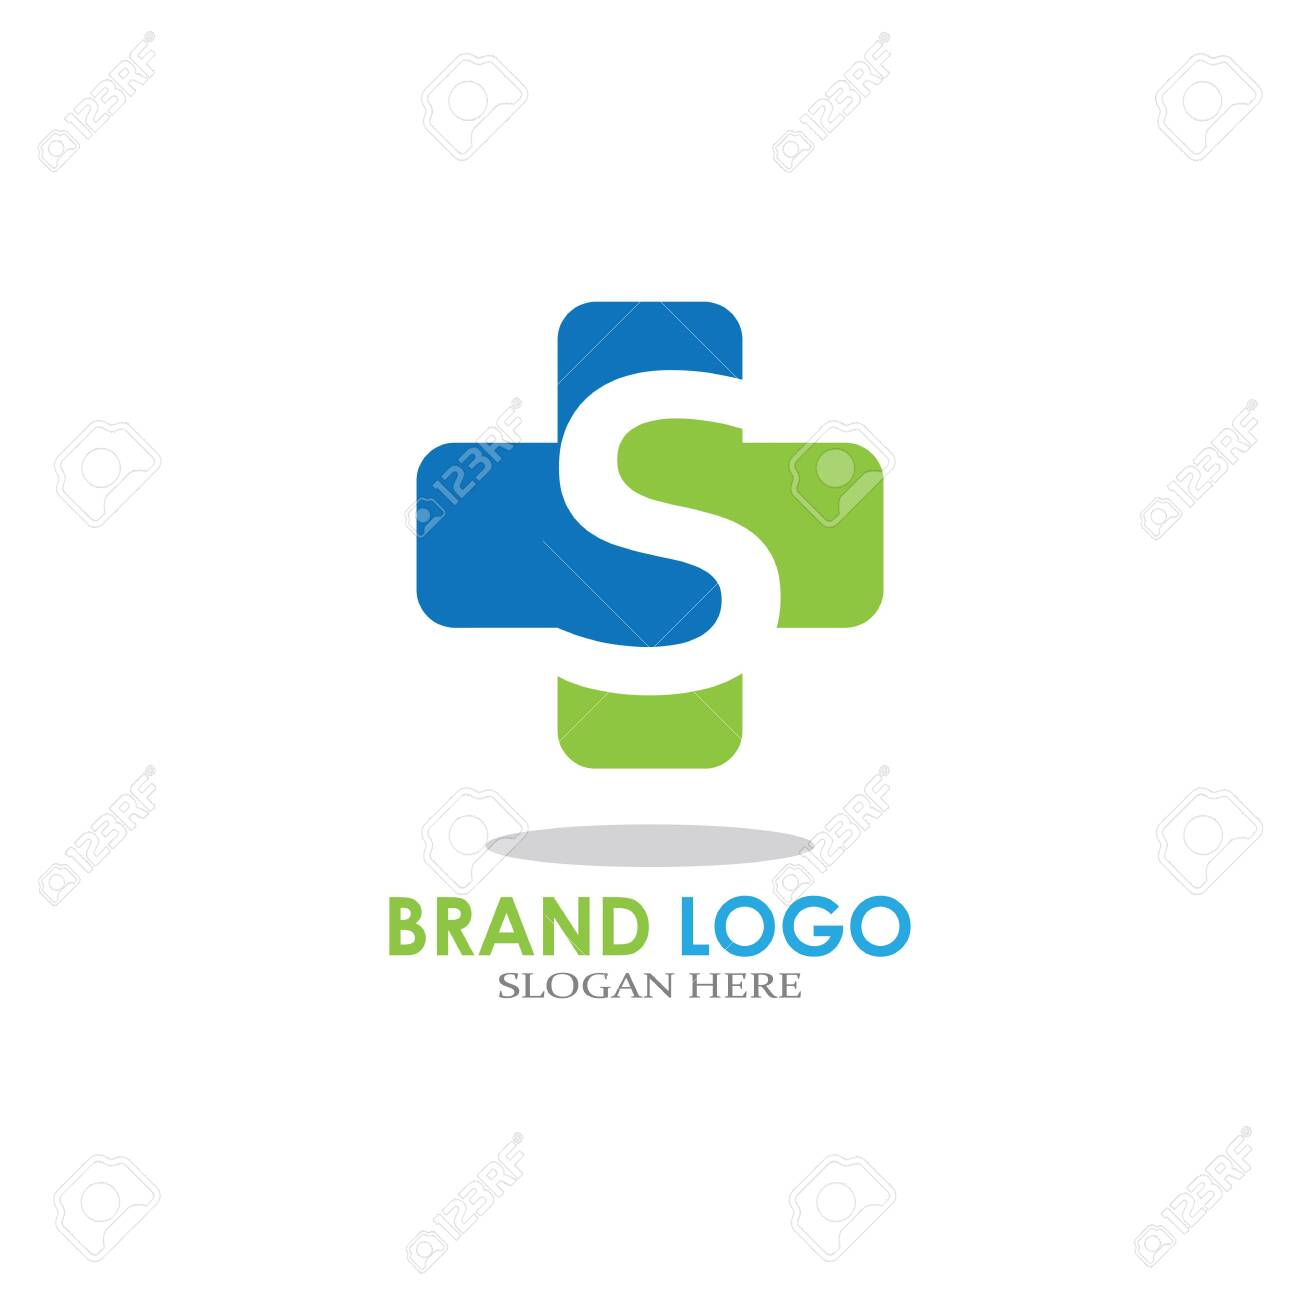 letter with Plus Hospital logo design vector - 152810717